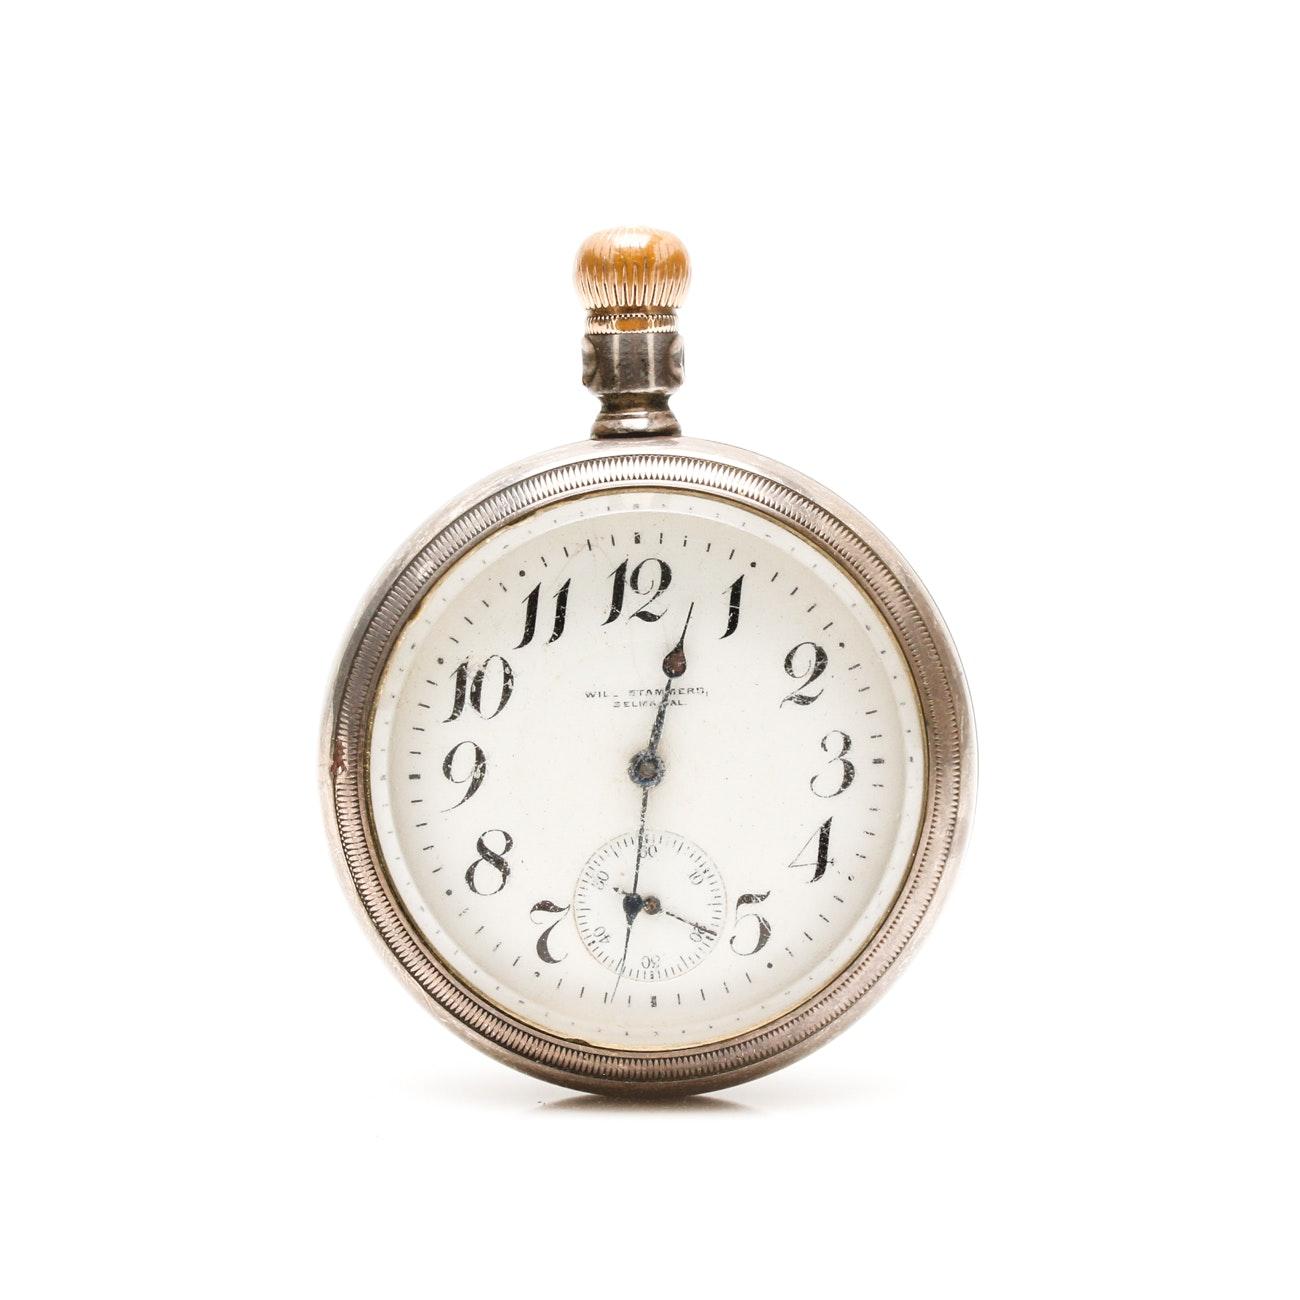 Antique Sterling Silver P.S. Bartlett Open Face Pocket Watch